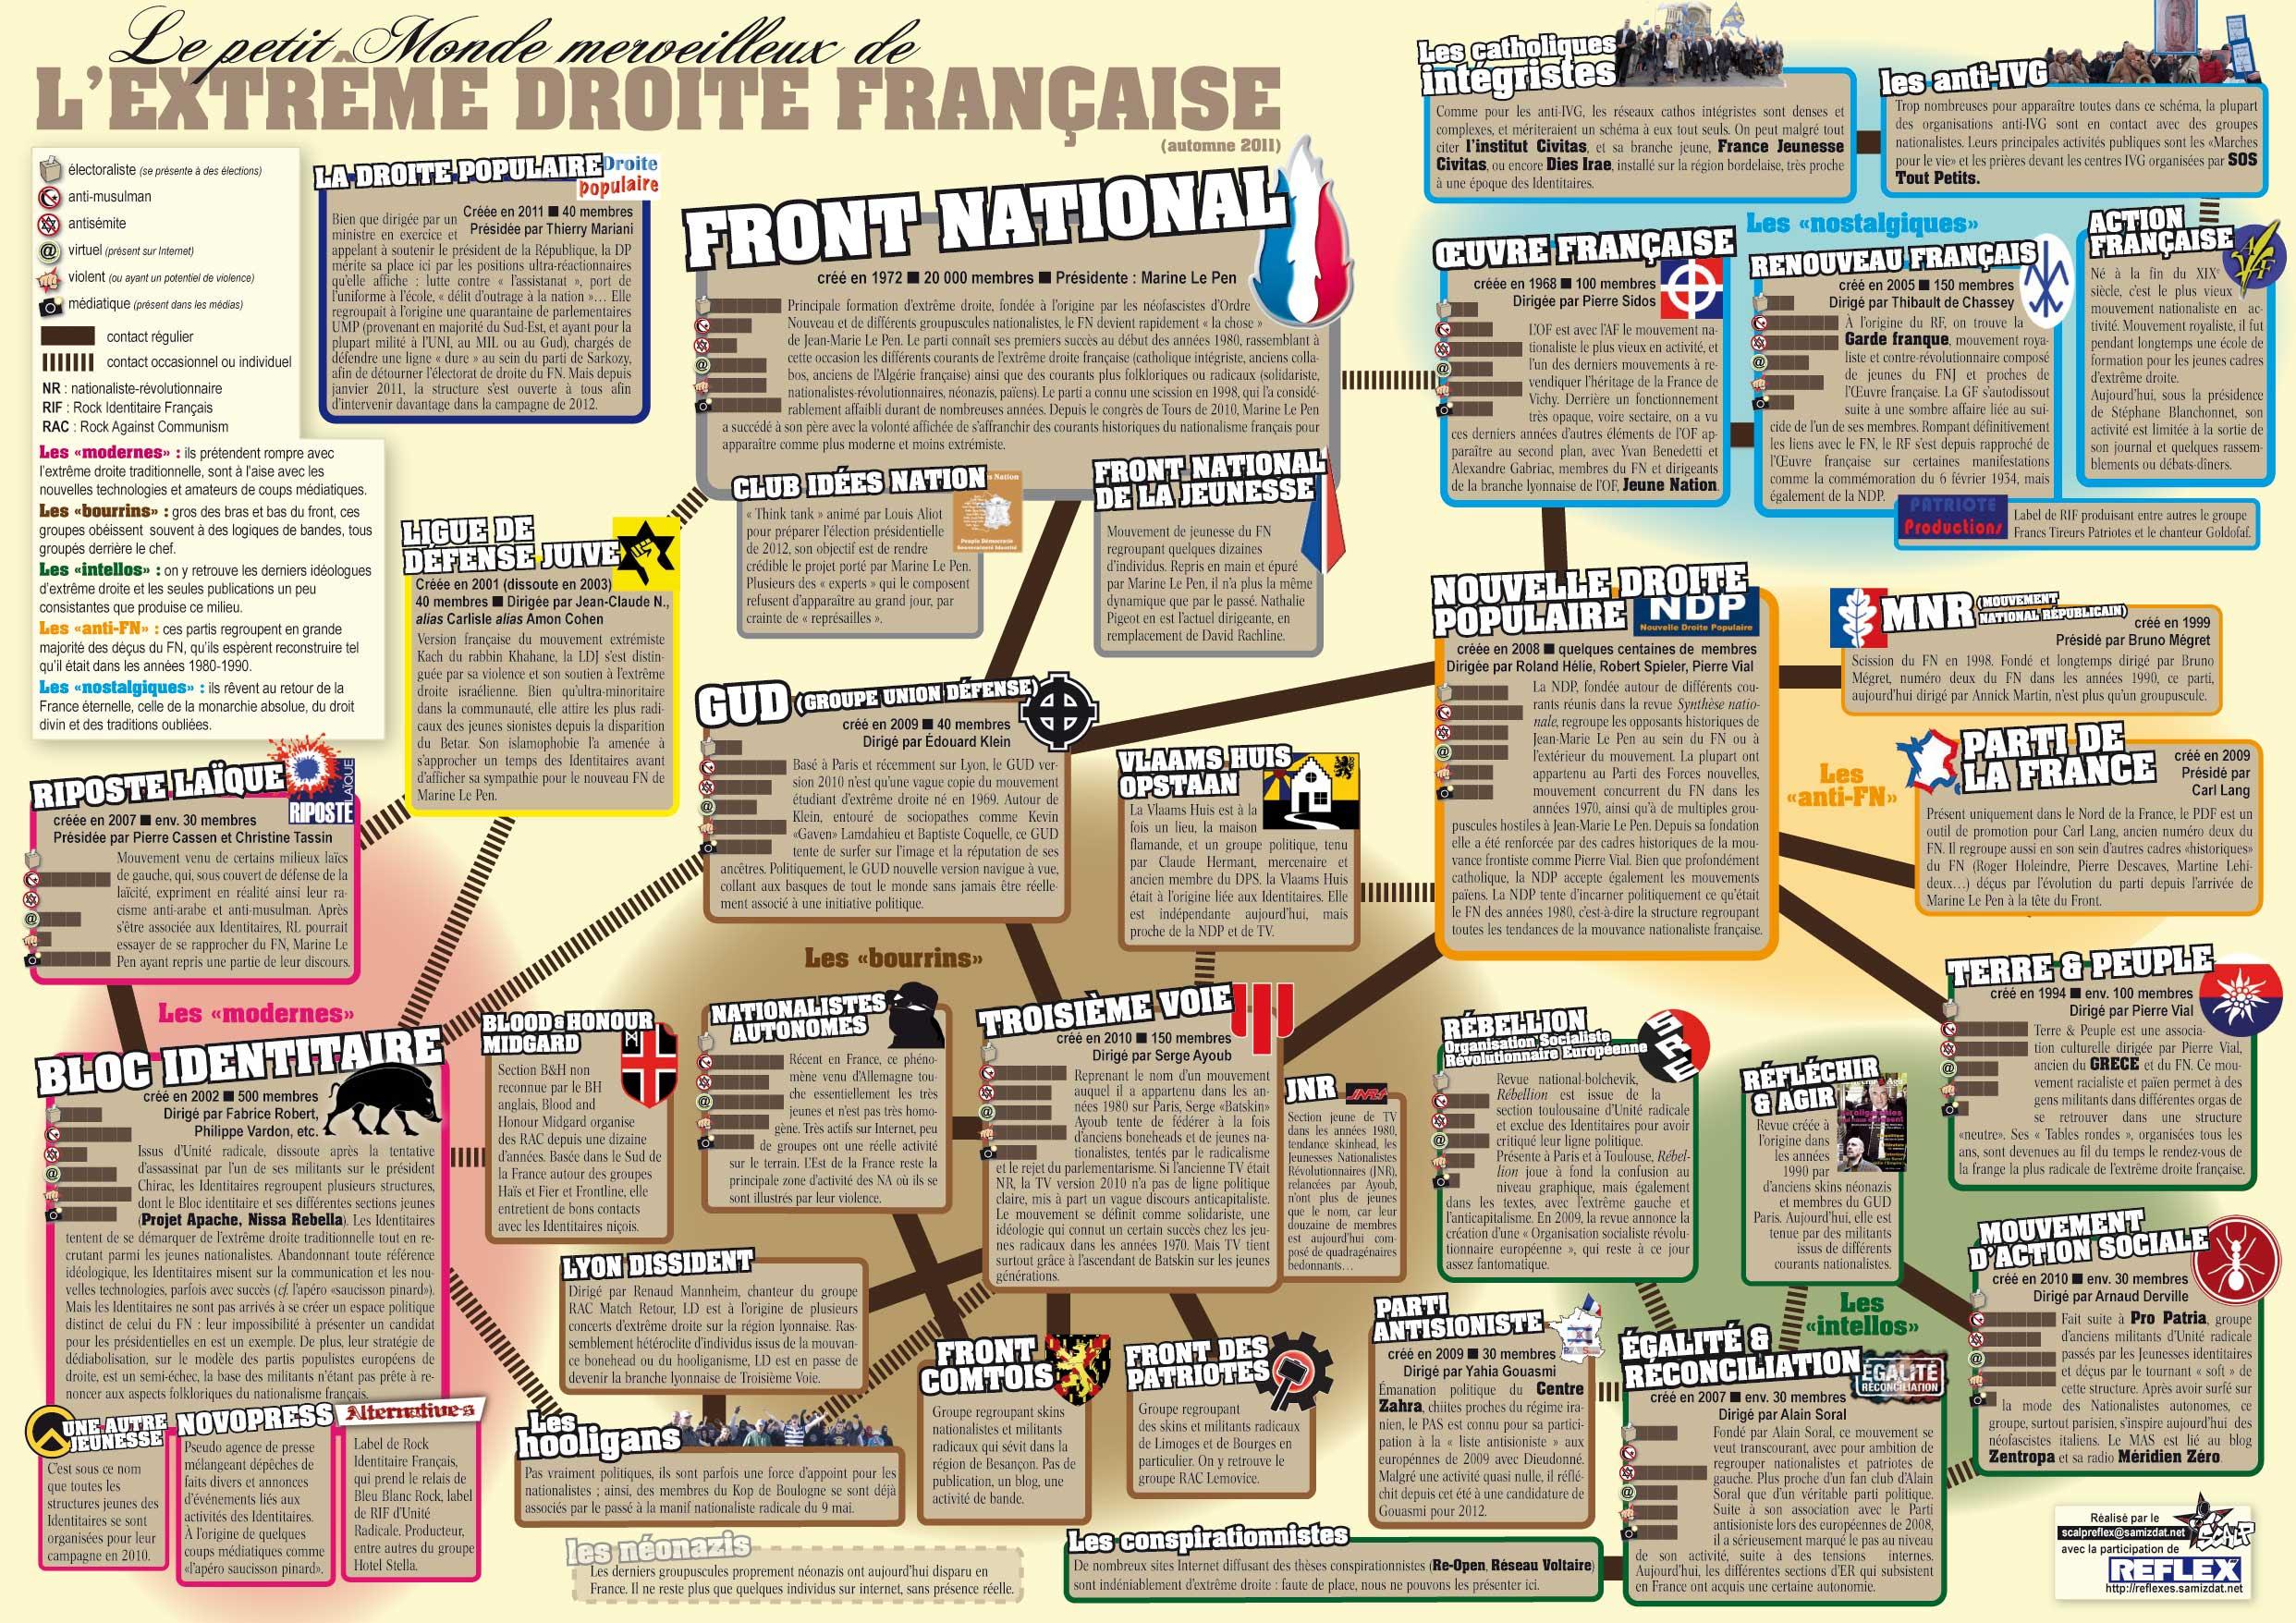 http://bataillesocialiste.files.wordpress.com/2011/10/carto.jpg